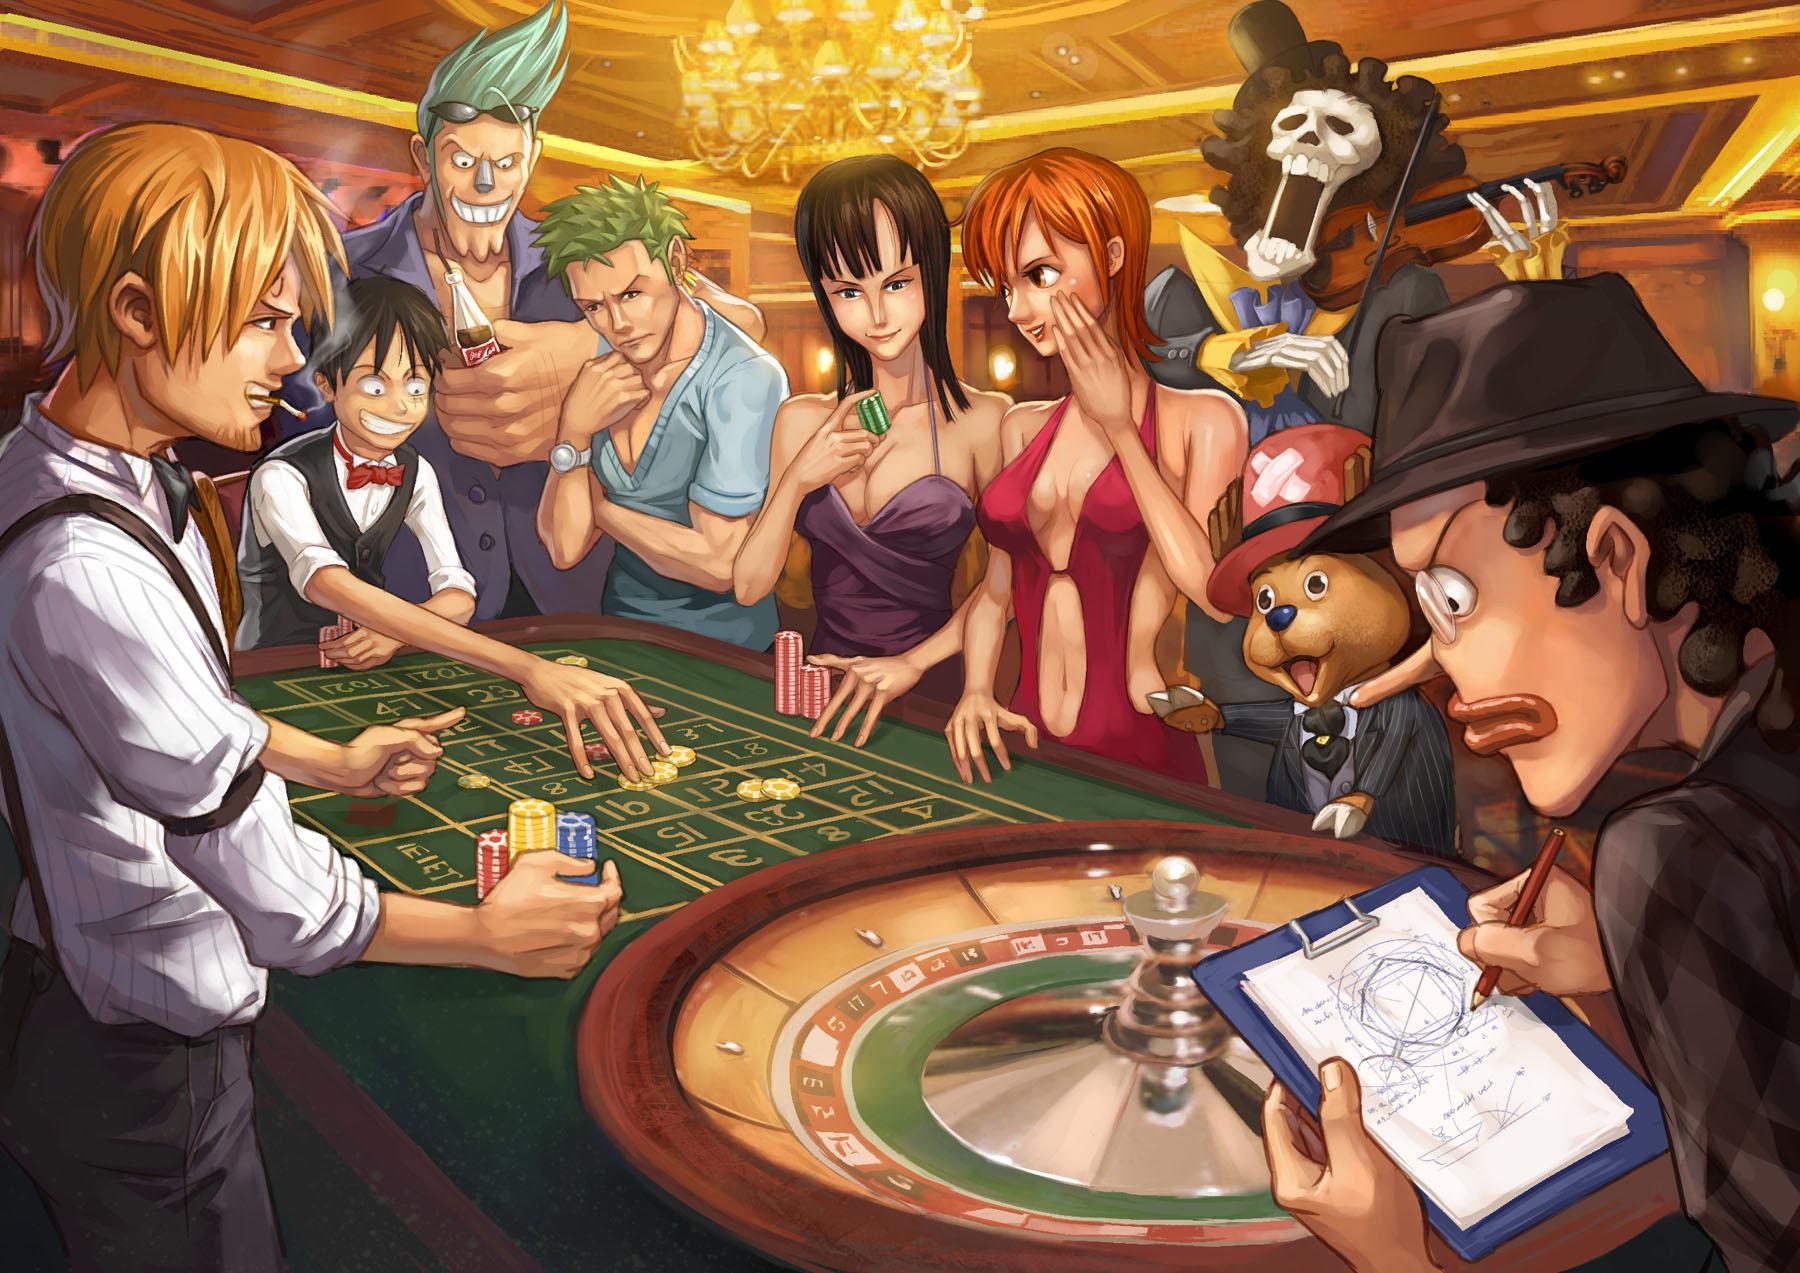 Full Anime One Piece Wallpaper 1800x1273